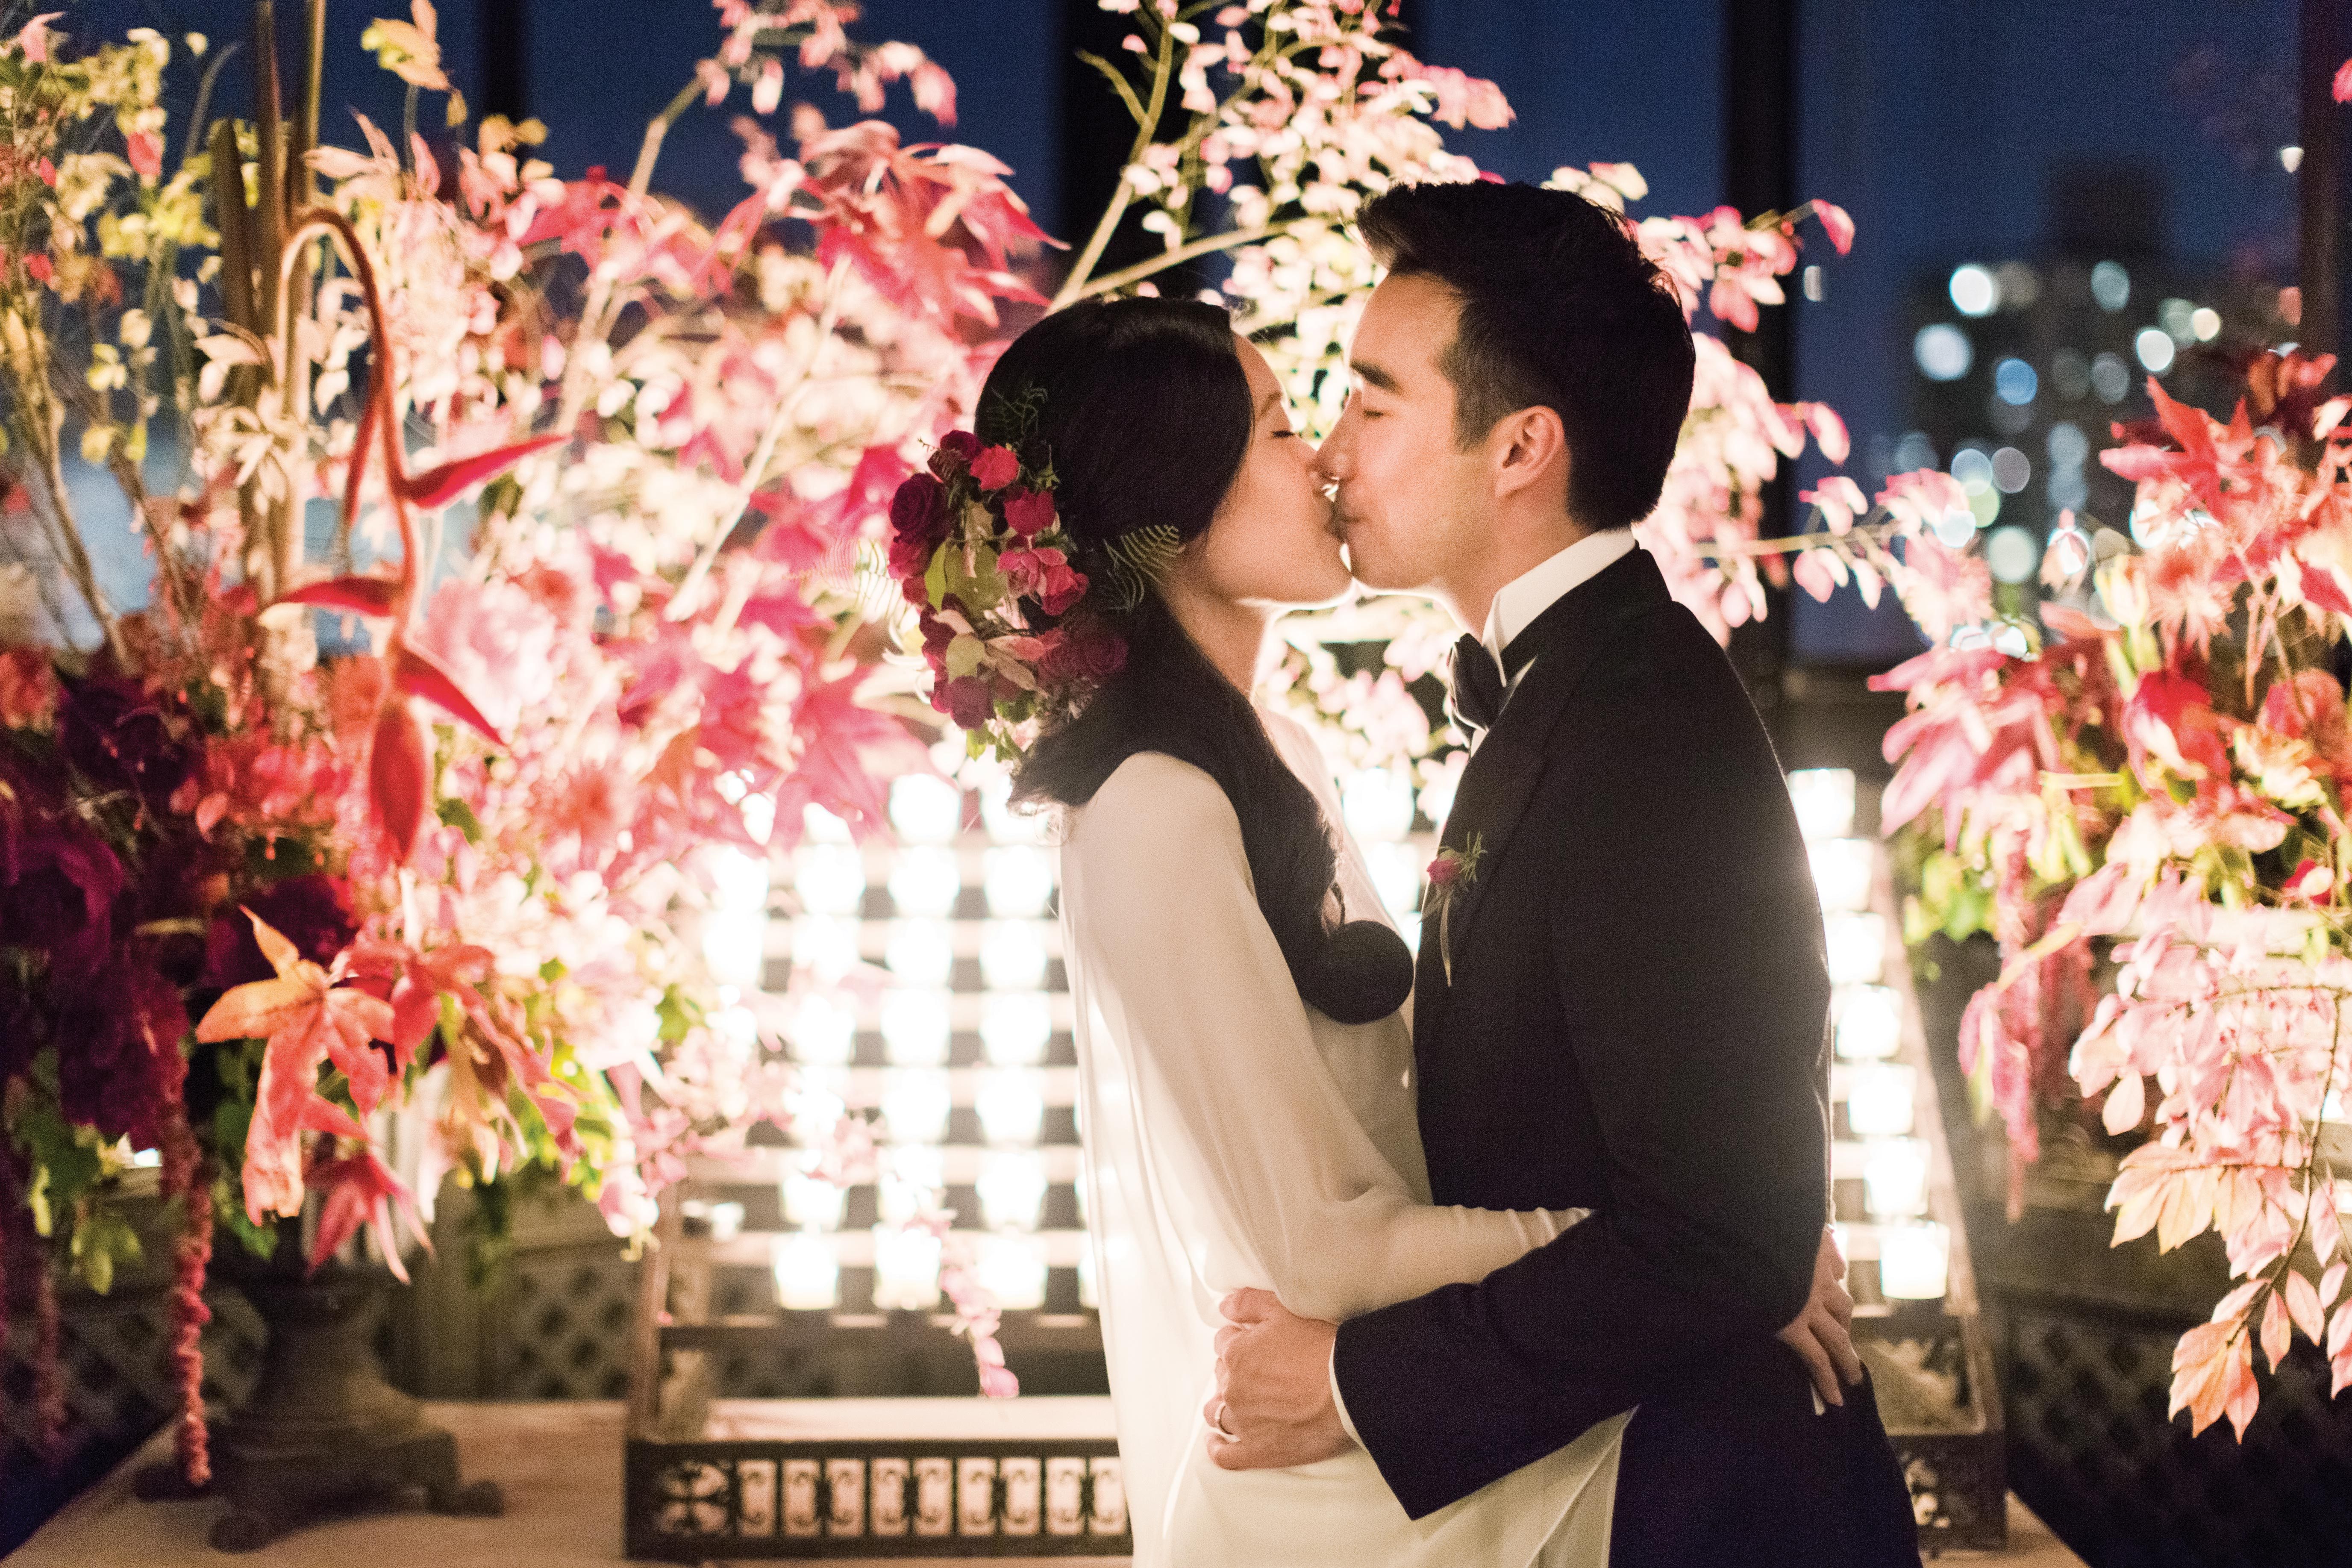 glara matthew wedding bride groom kiss